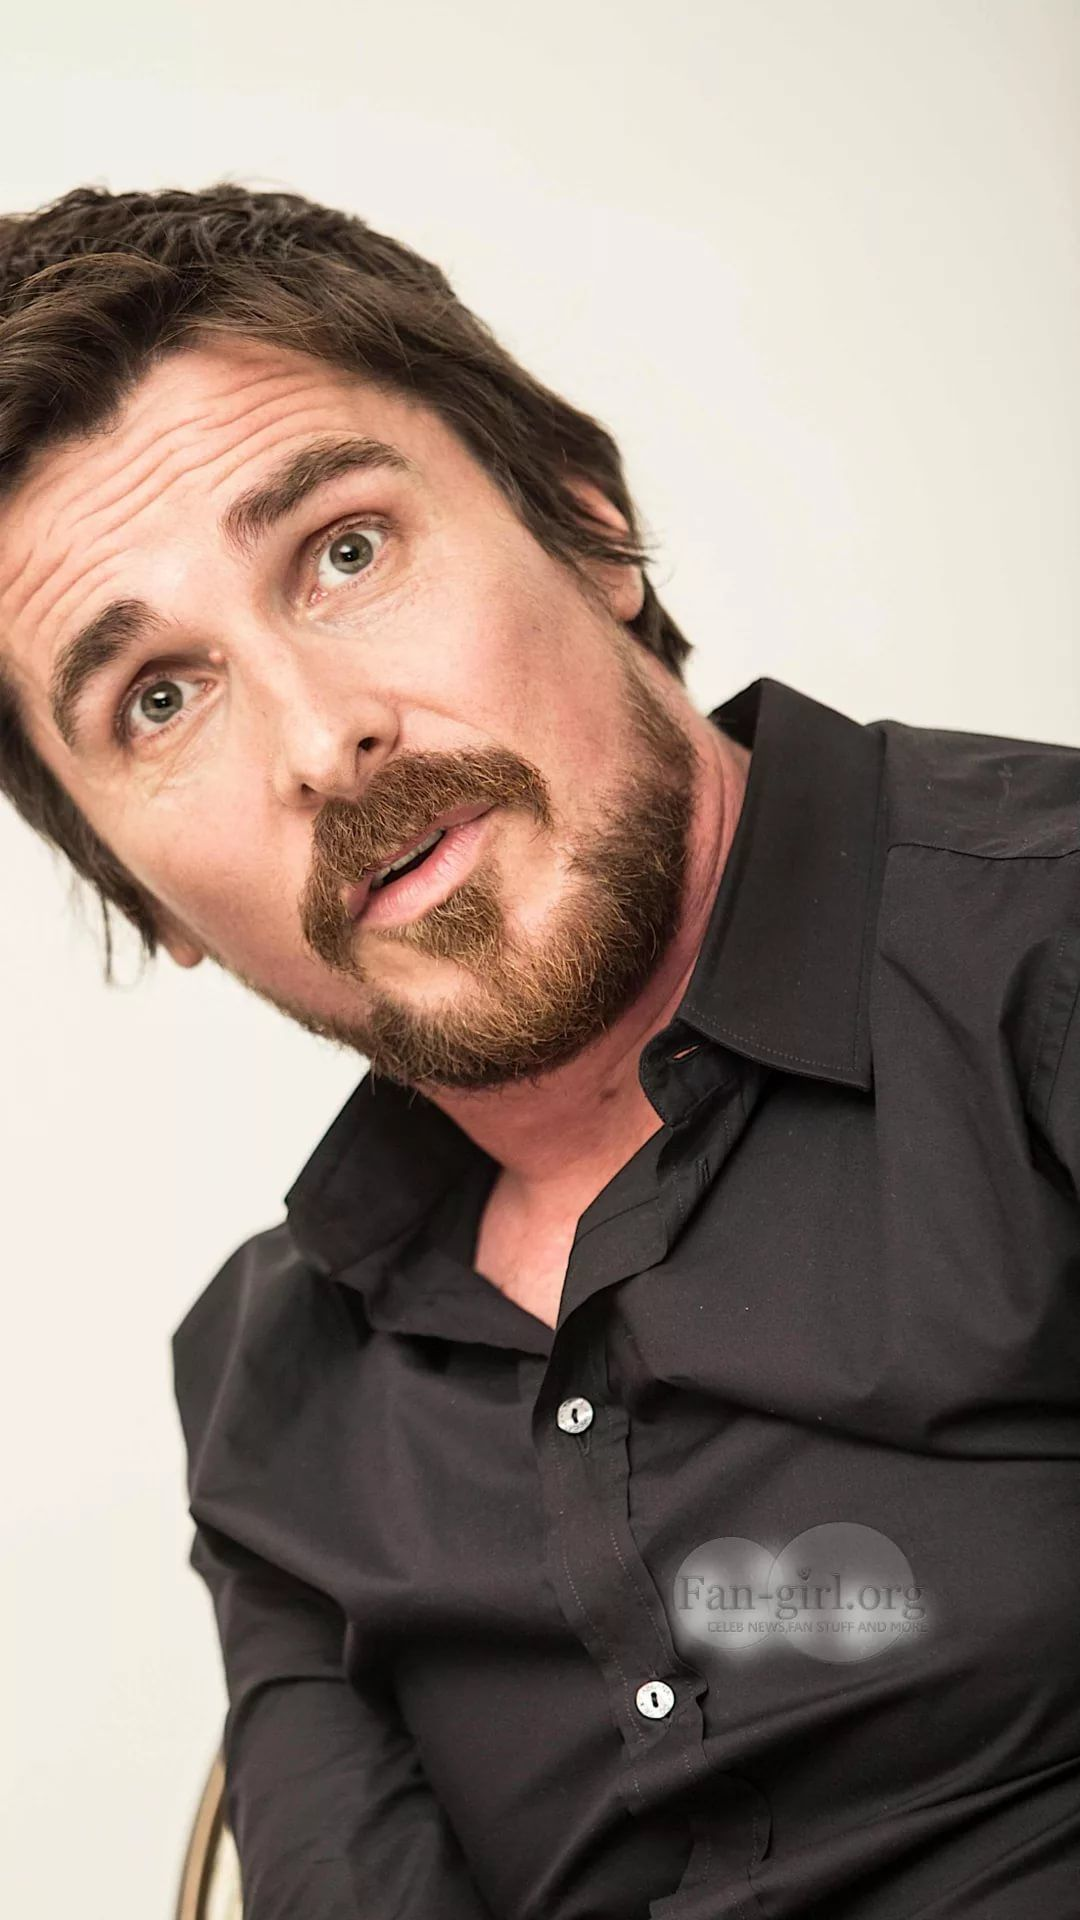 Christian Bale iPhone 5 wallpaper